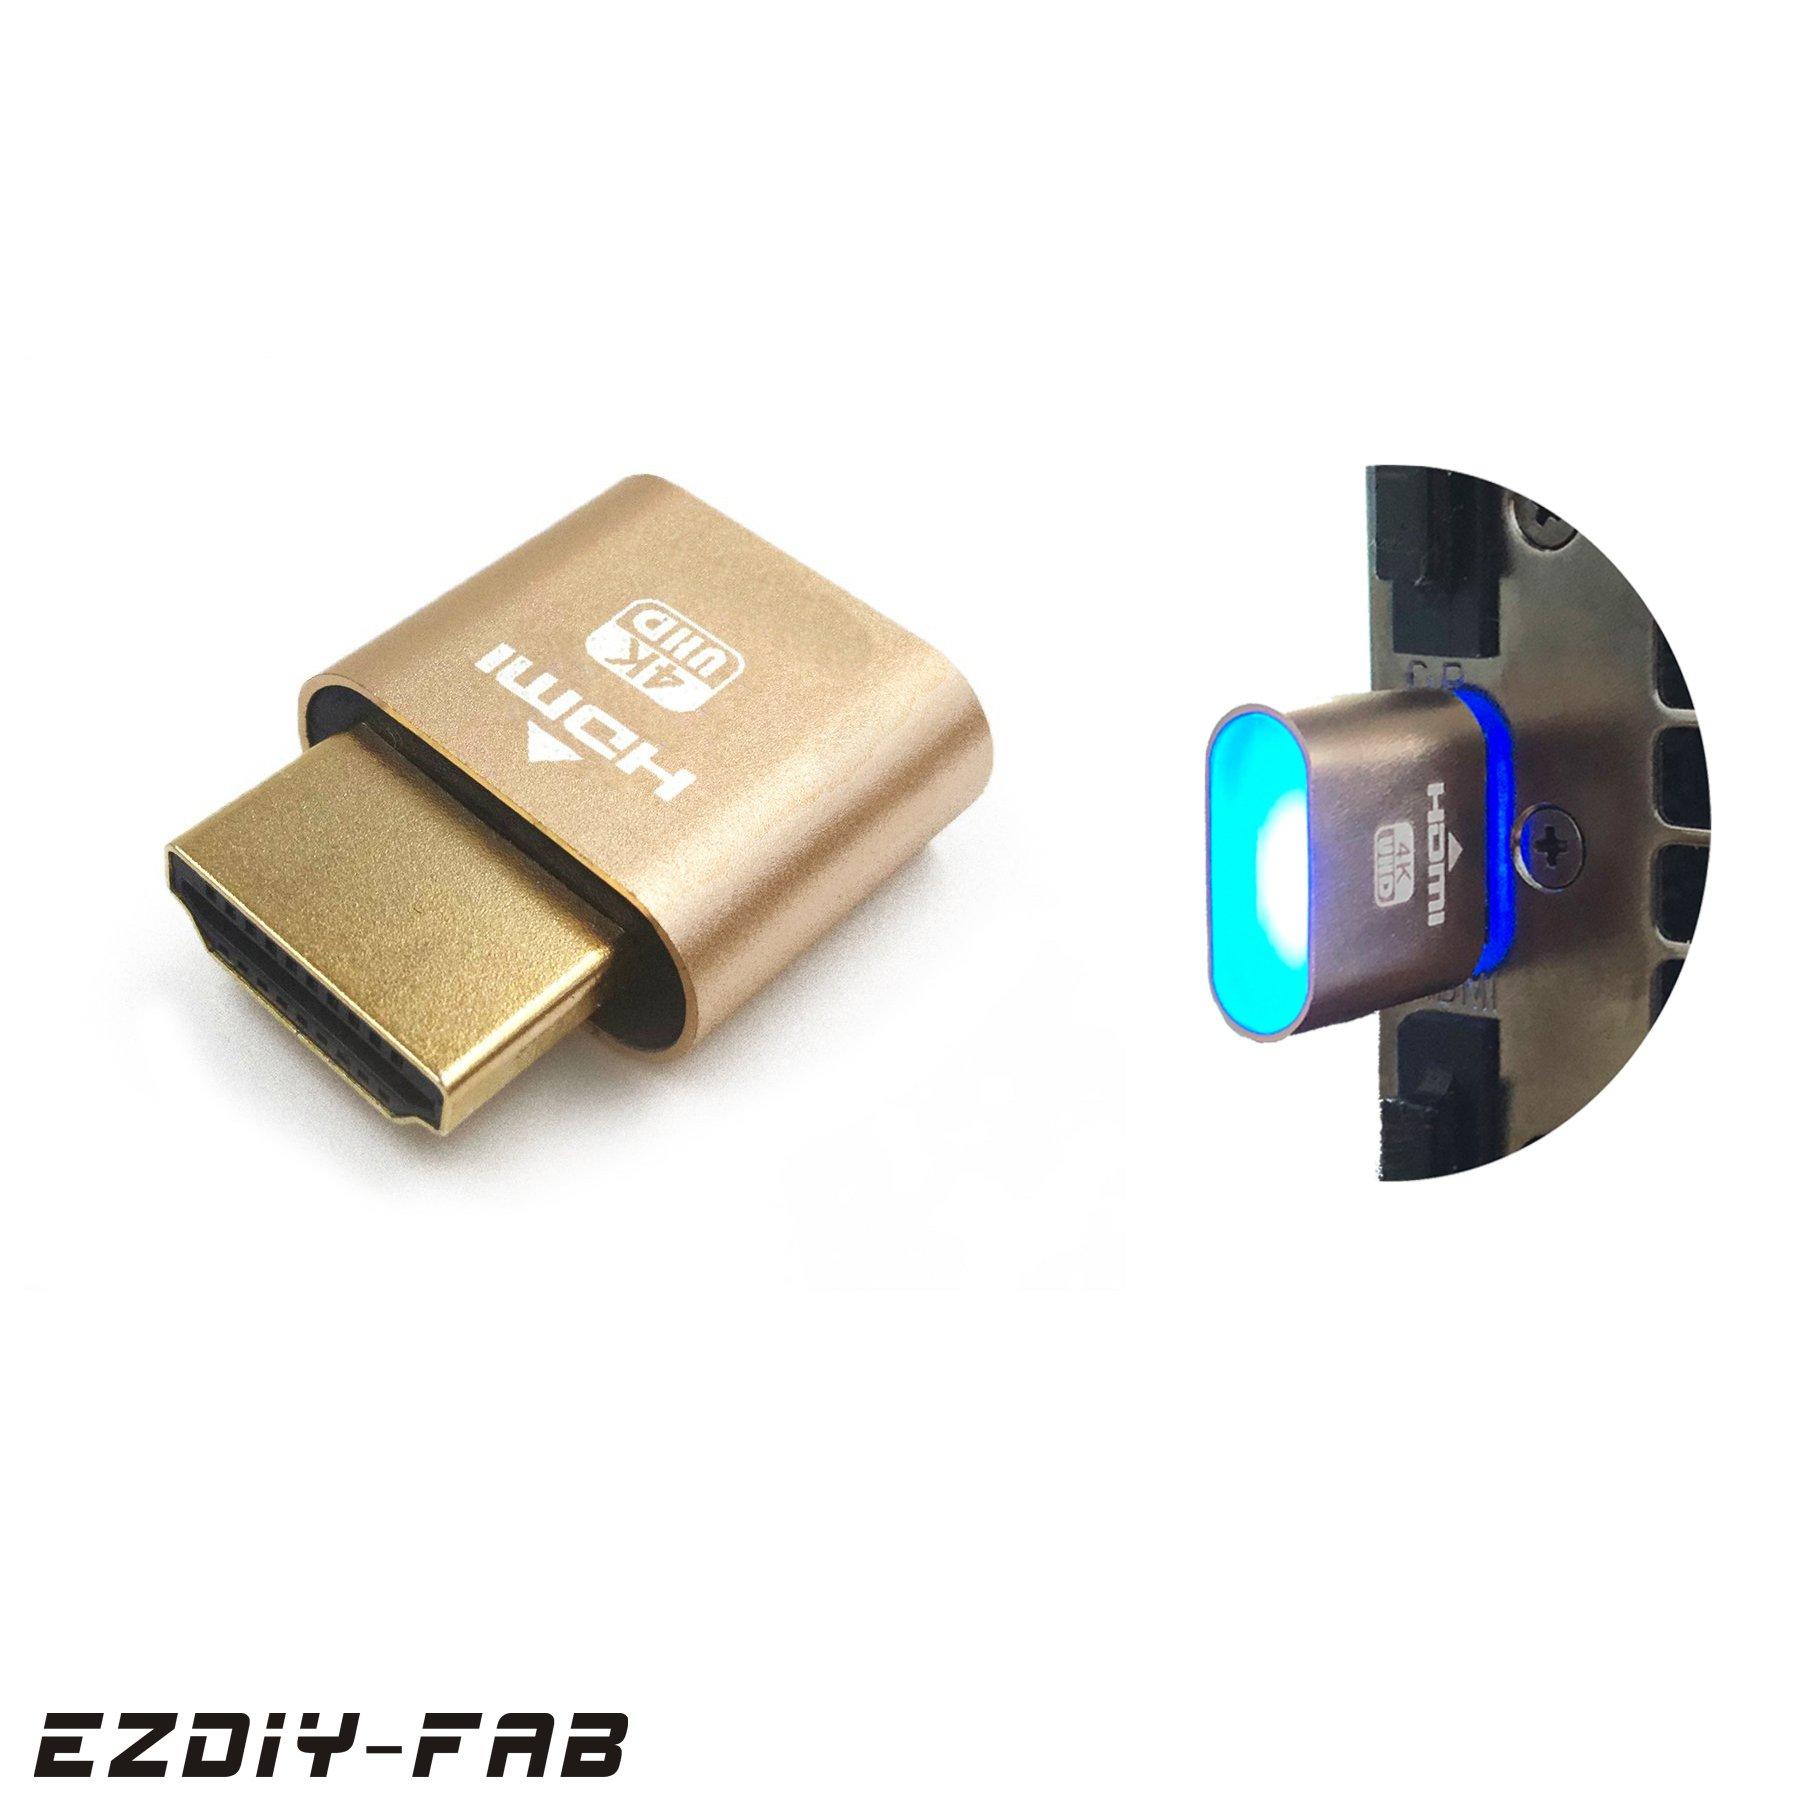 EZDIY-FAB HDMI dummy plug with LED,Headless Ghost, Display Emulator, GPU VGA Supports 4K 3840x2160@60Hz-1 Pack for Mining